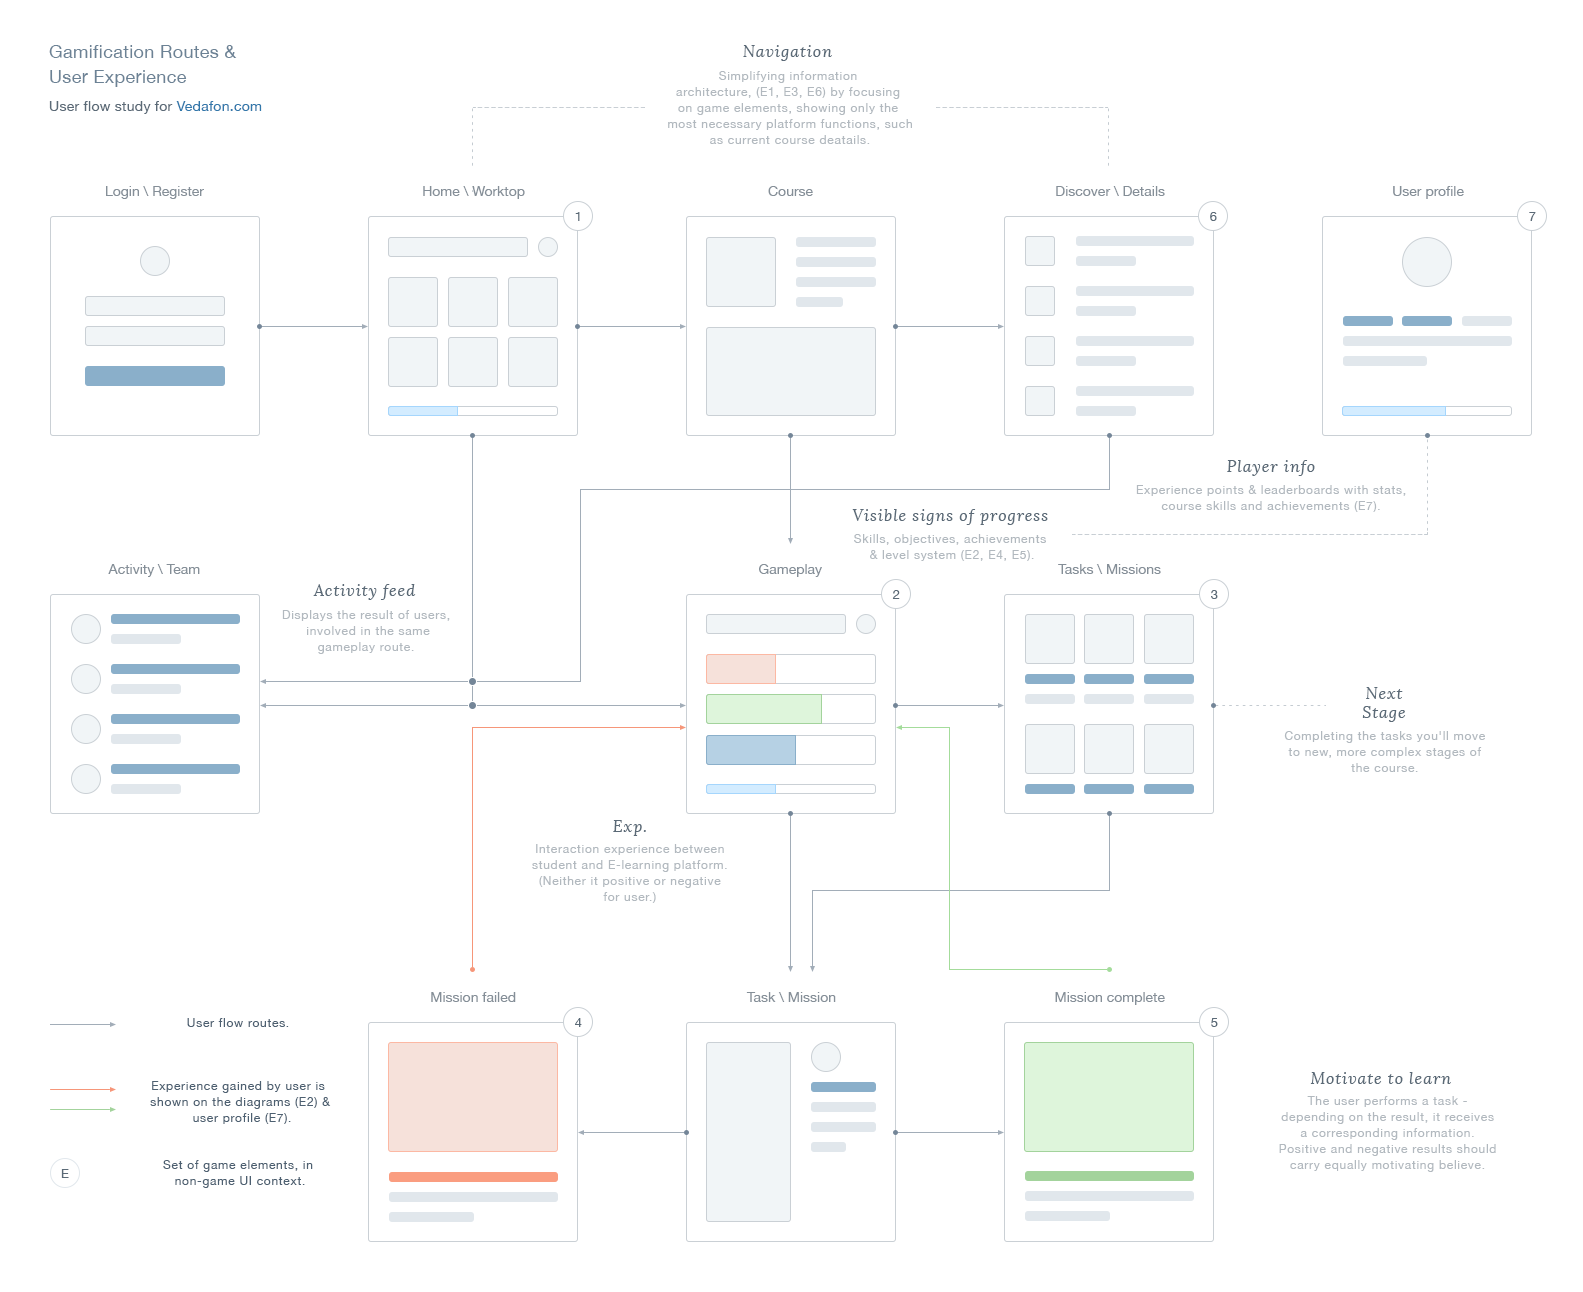 Ux gamification routes | UI/UE design - web、software | Pinterest